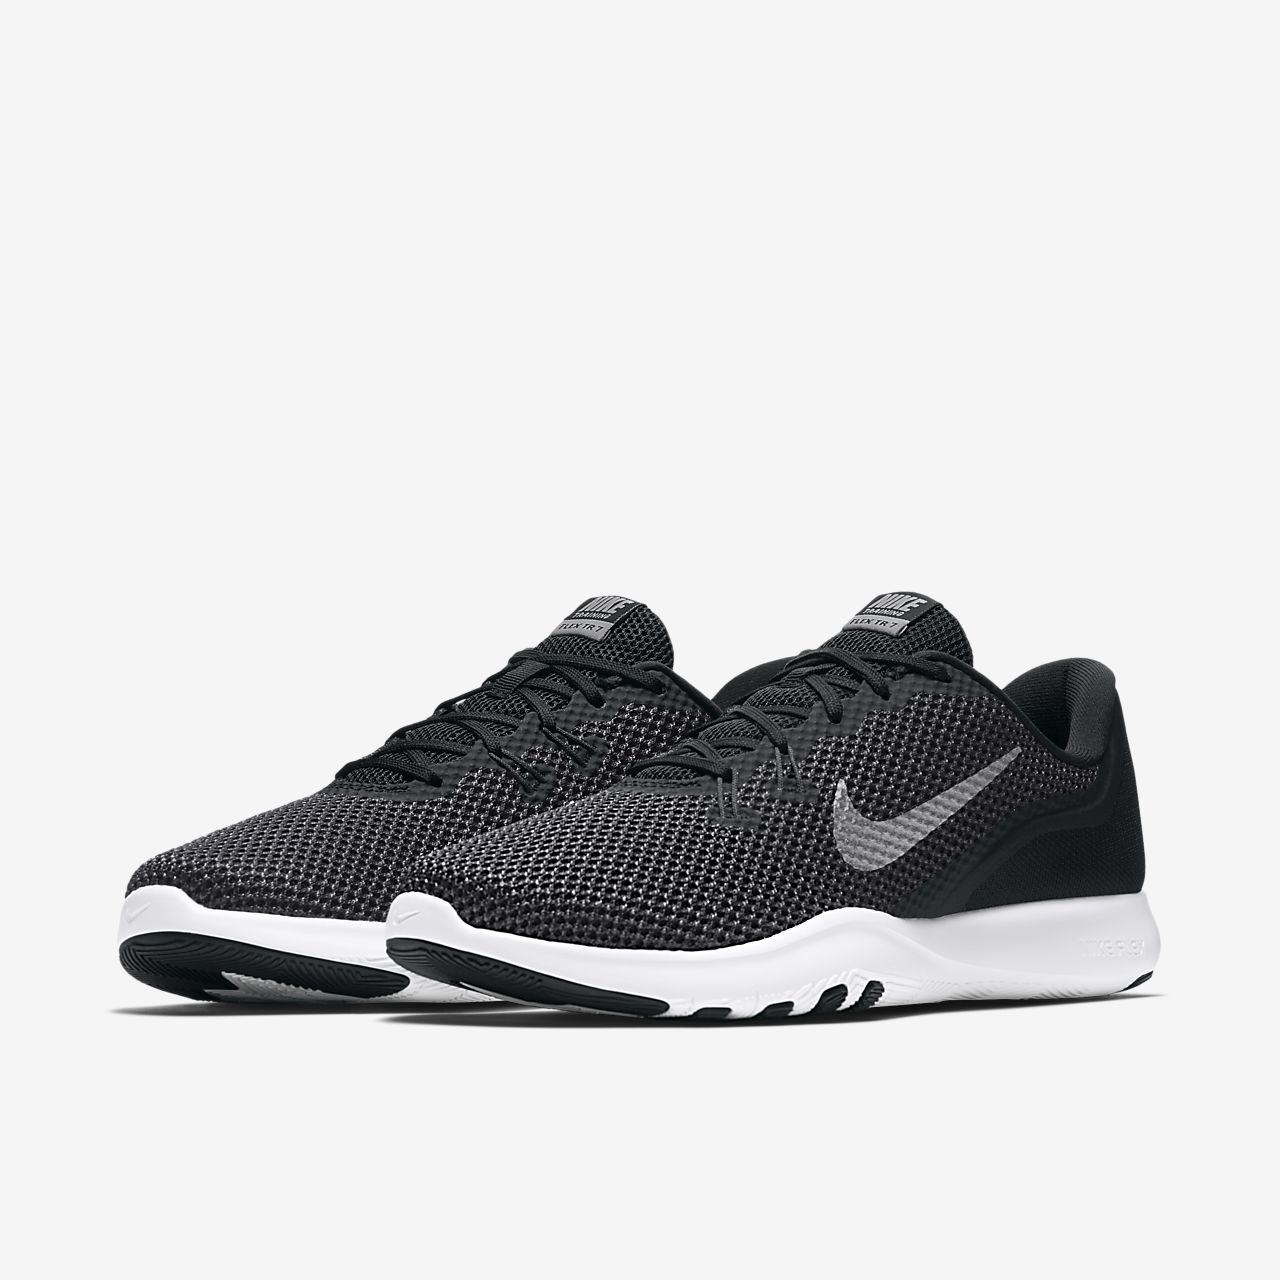 bbd5bdd04573e3 Nike Flex Trainer 7 Women s Gym Dance Aerobics Shoe. Nike.com AU